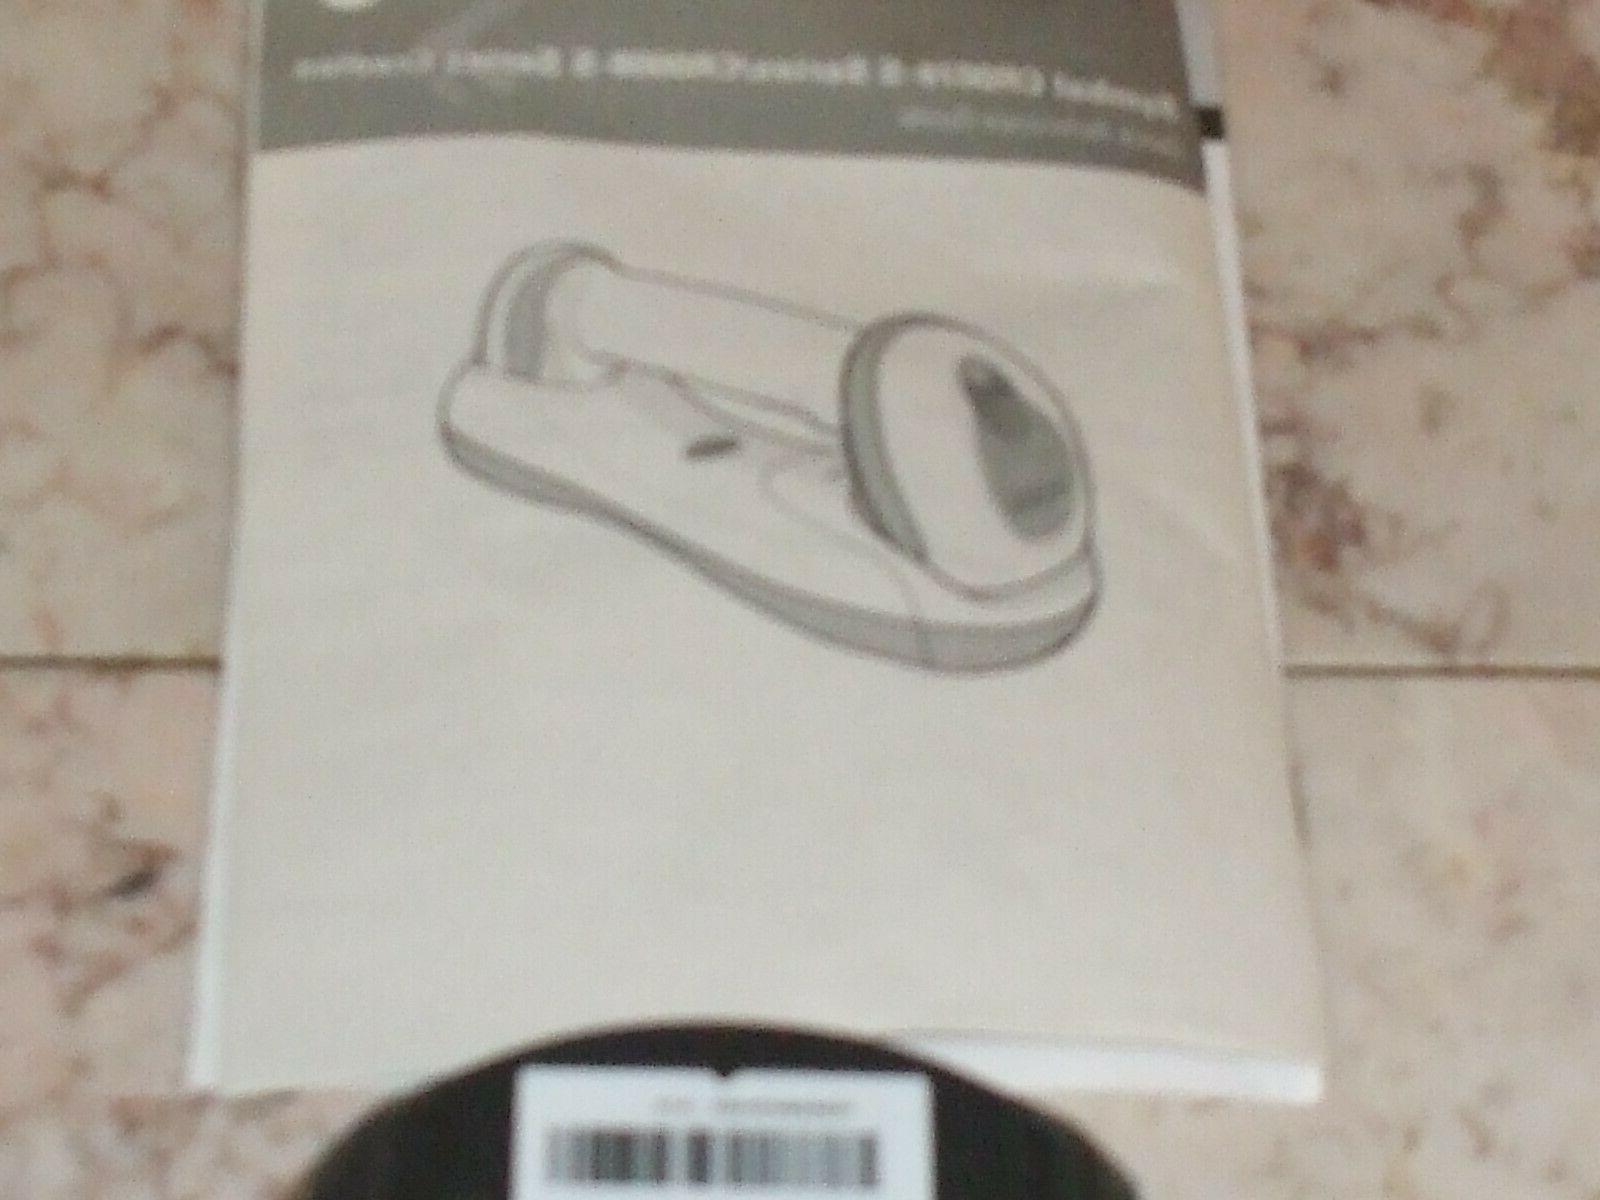 Motorola Symbol Scanner Cradle